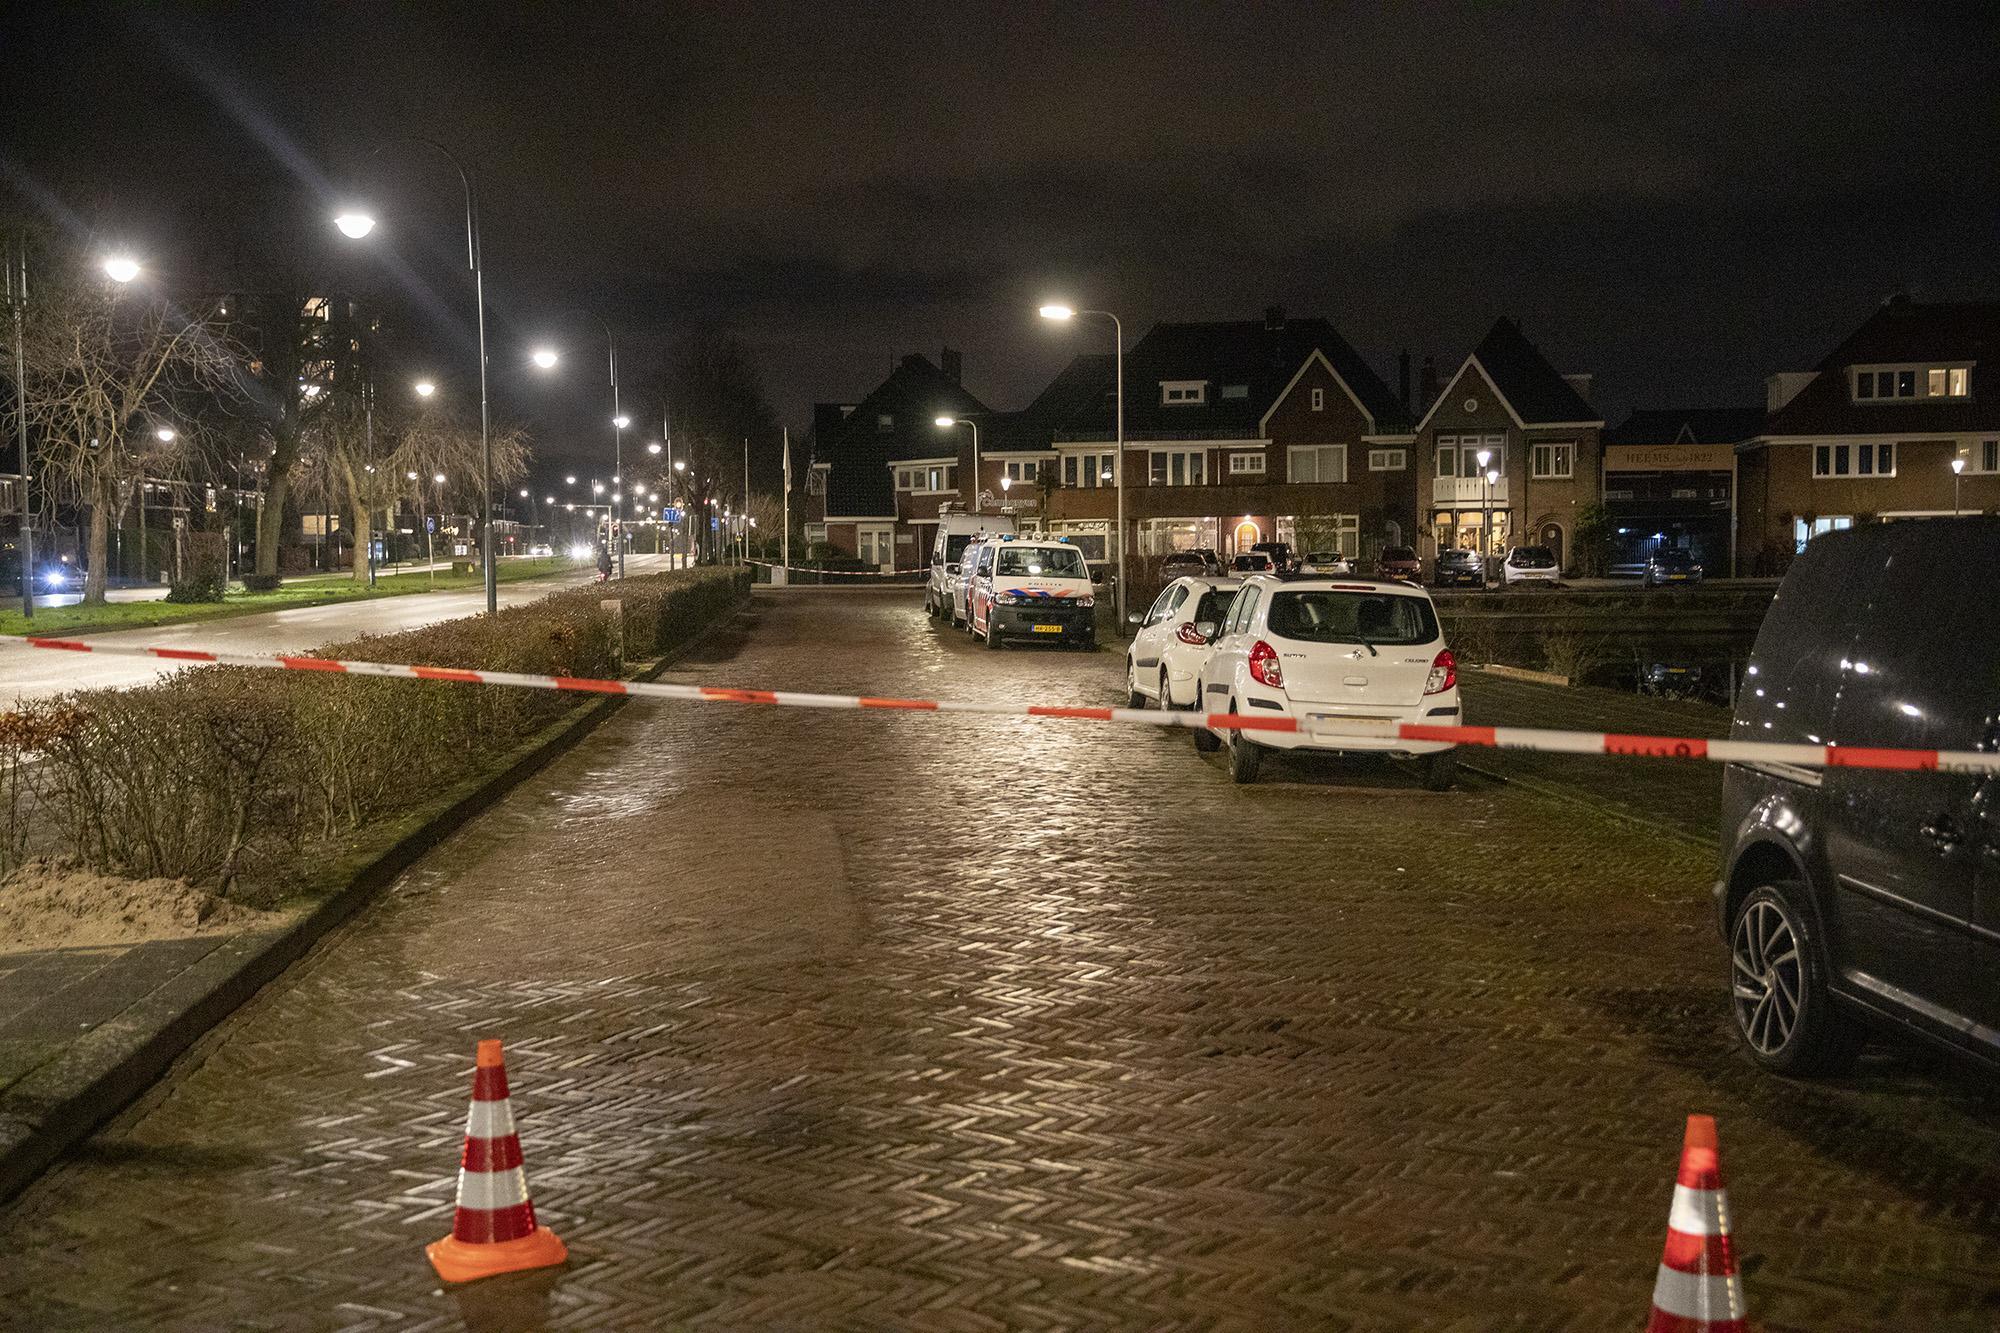 Aanhouding na vondst illegaal vuurwerk in kofferbak in Heemstede